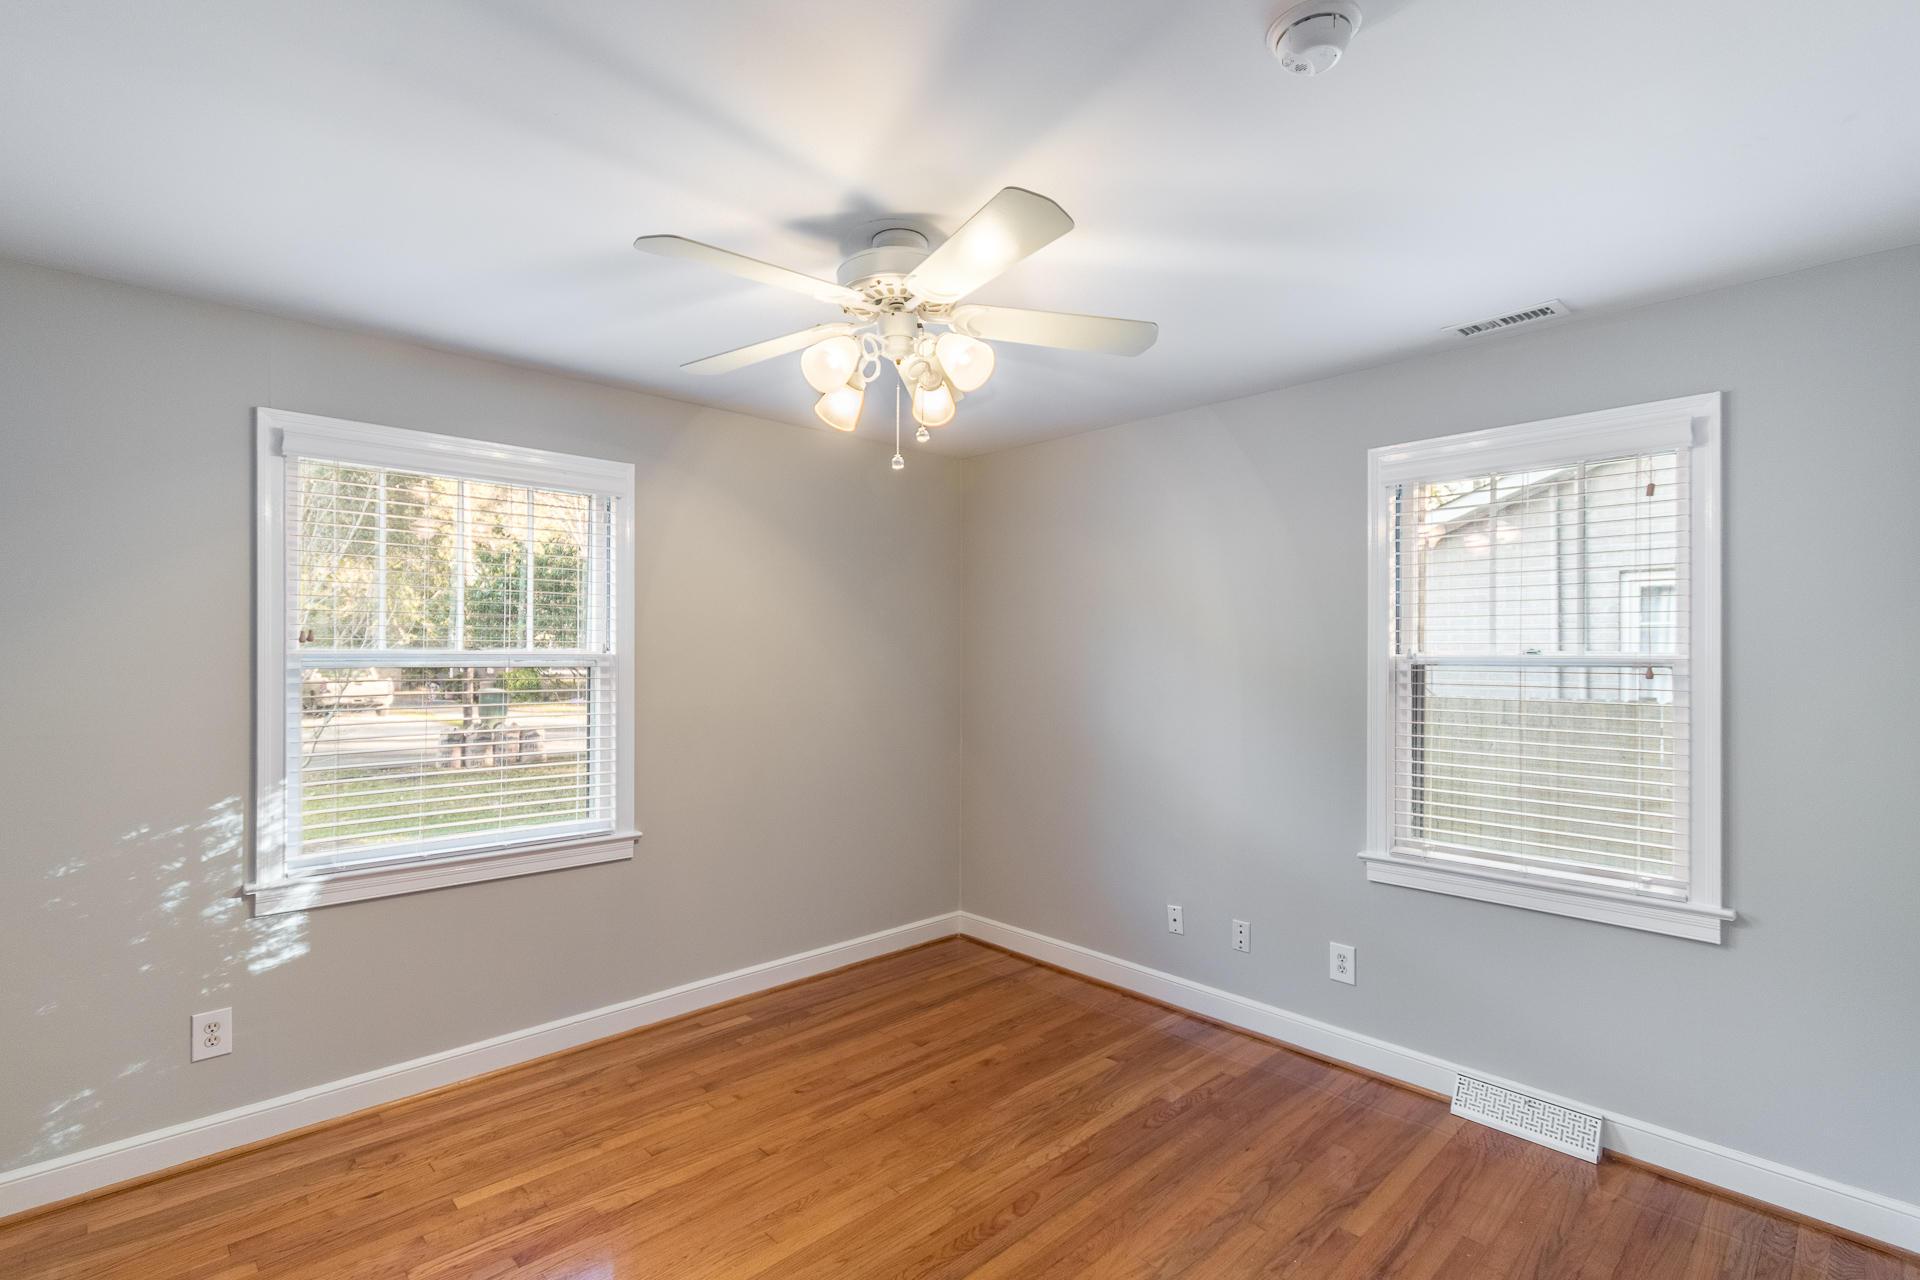 Edgewood Gardens Homes For Sale - 507 Risher, Charleston, SC - 23